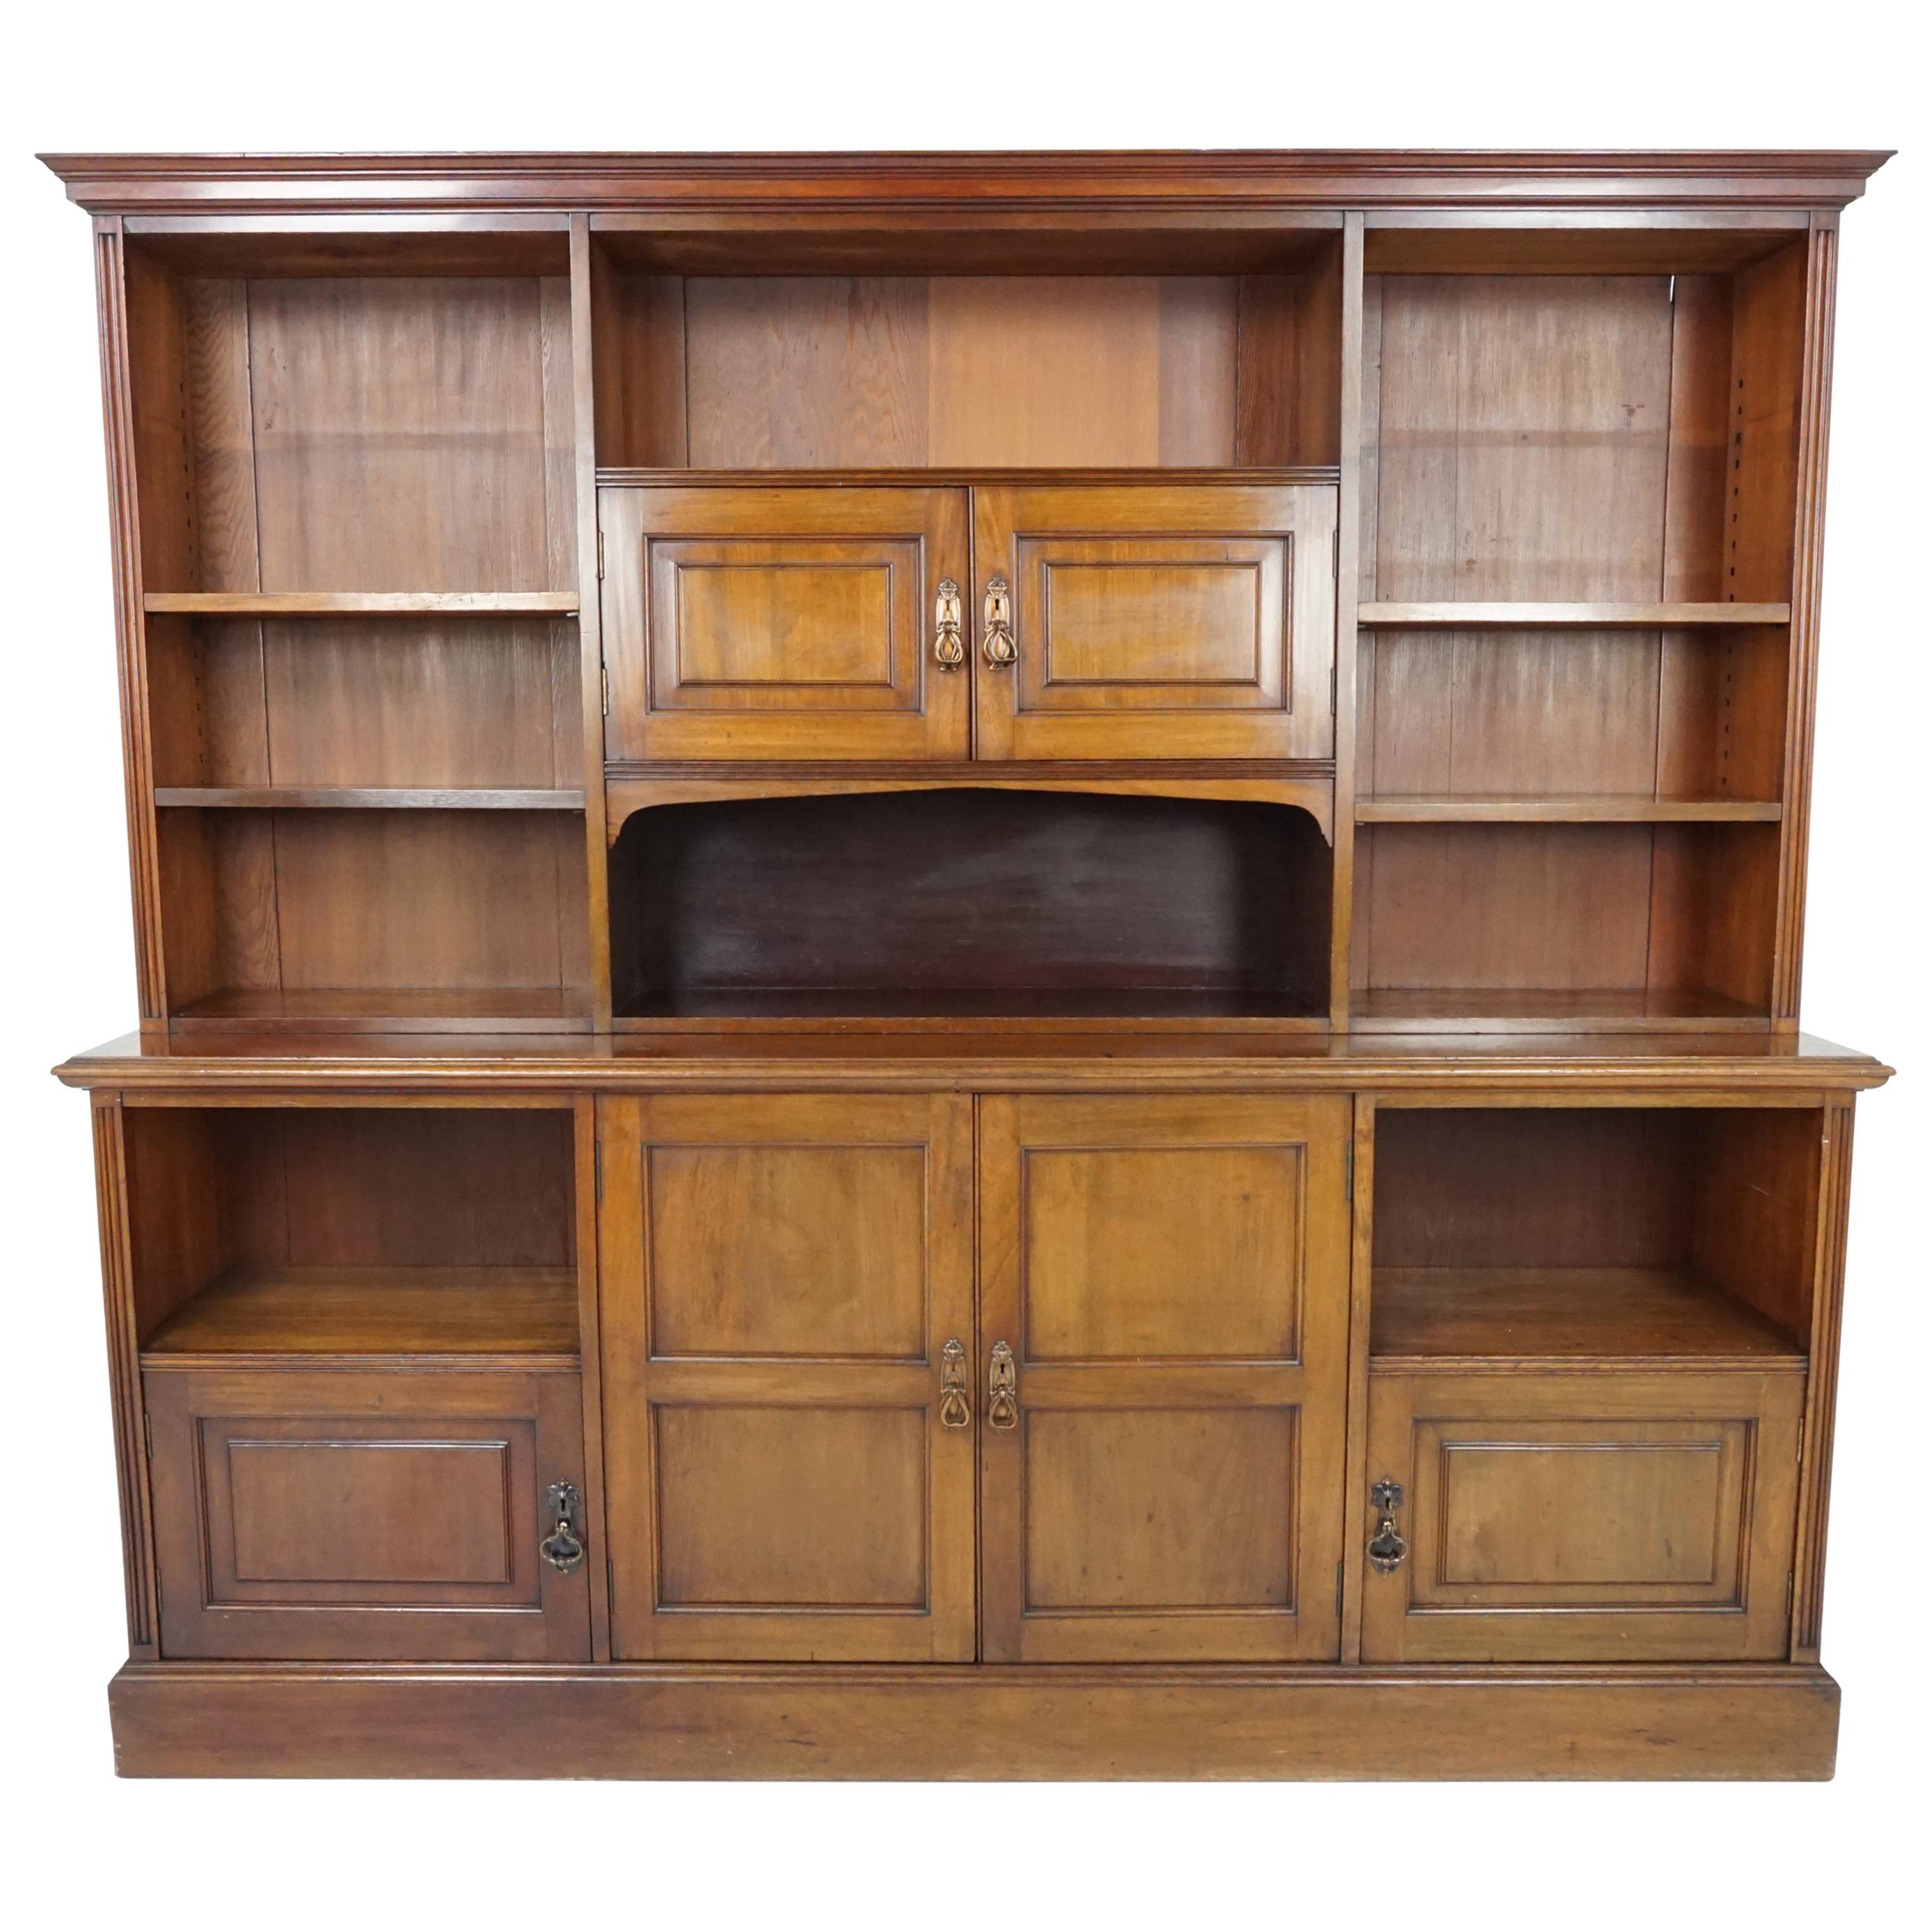 Antique Victorian Walnut Open Bookcase, Scotland 1875, B1861A